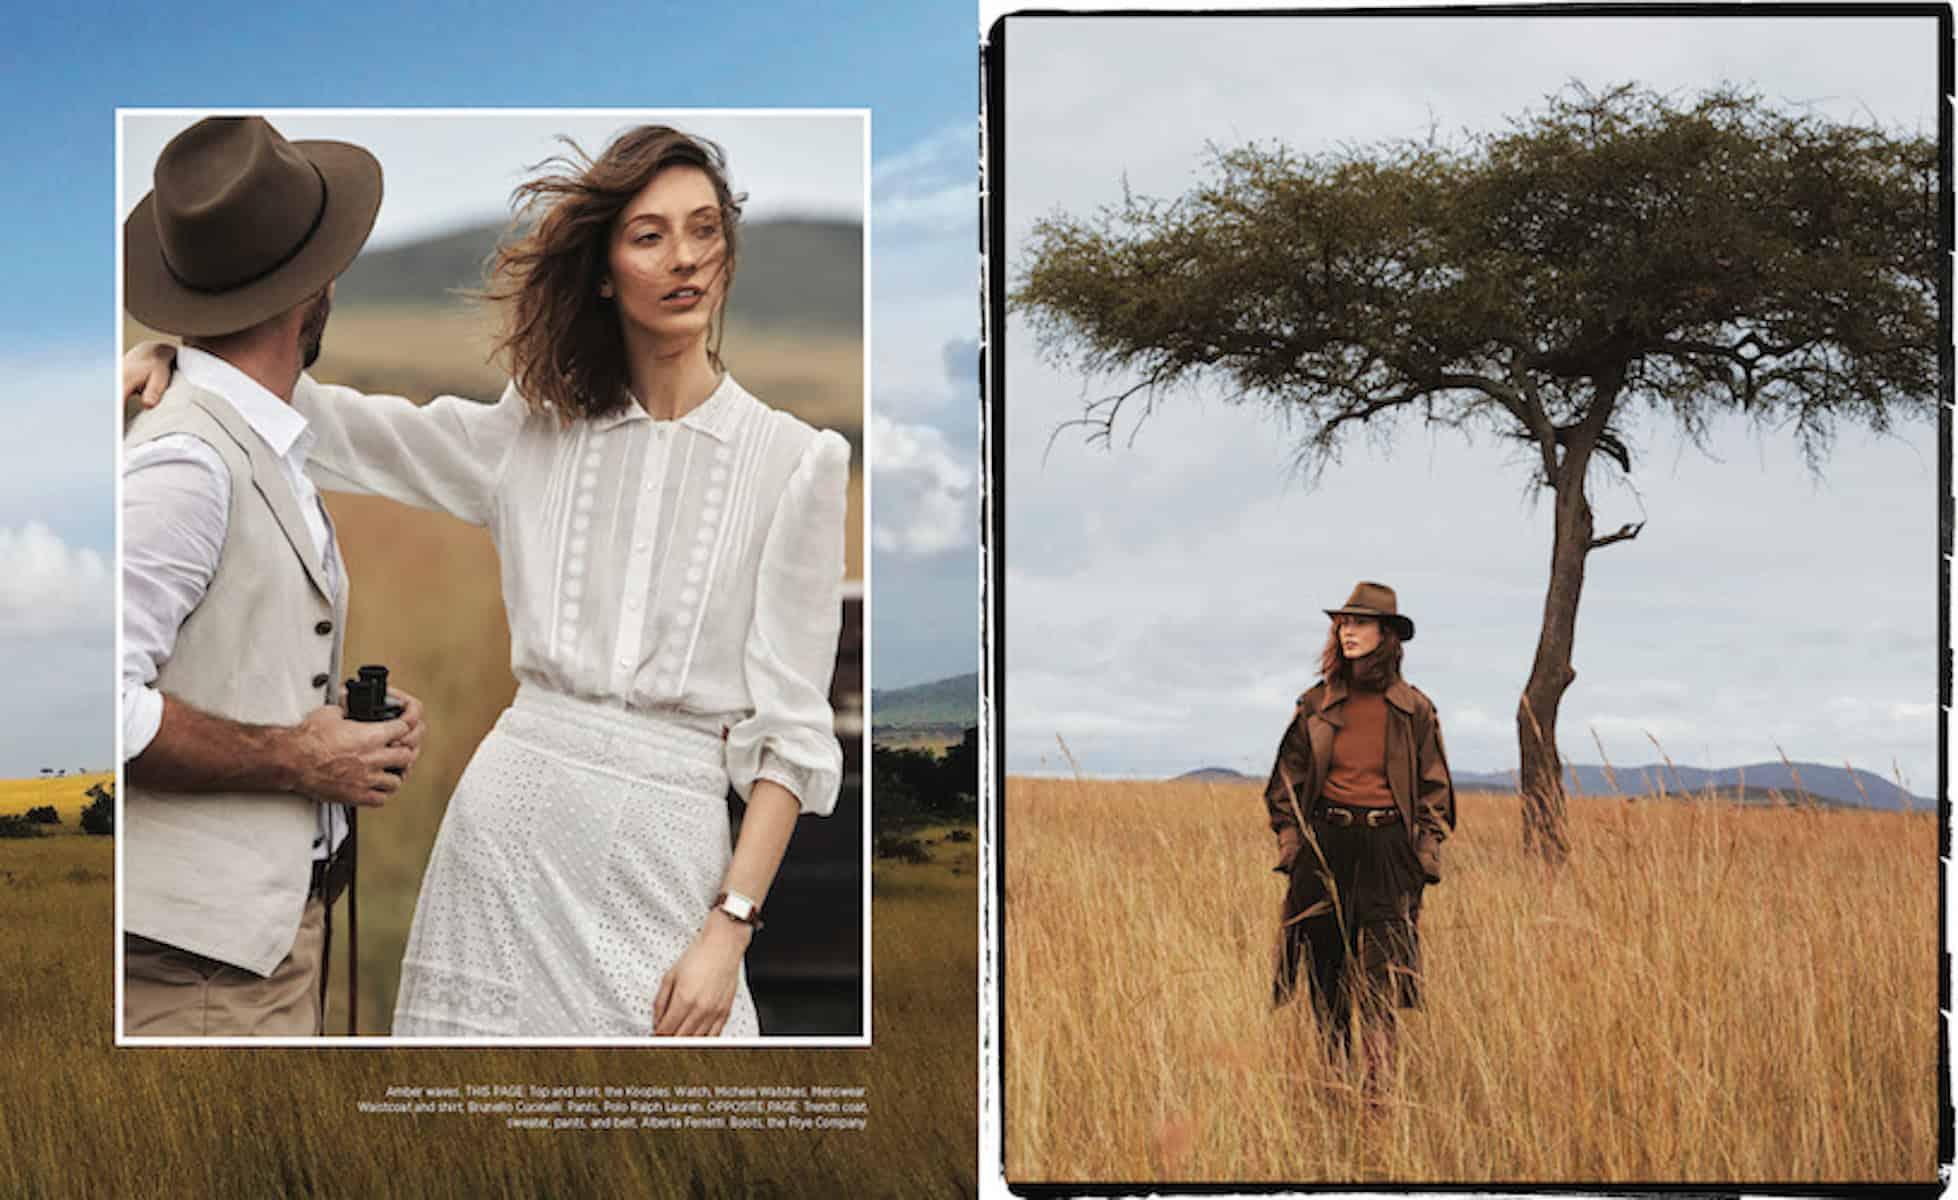 Harpers Bazaar – Alexi Lubomirski – Kenya - Production by Baker & Co